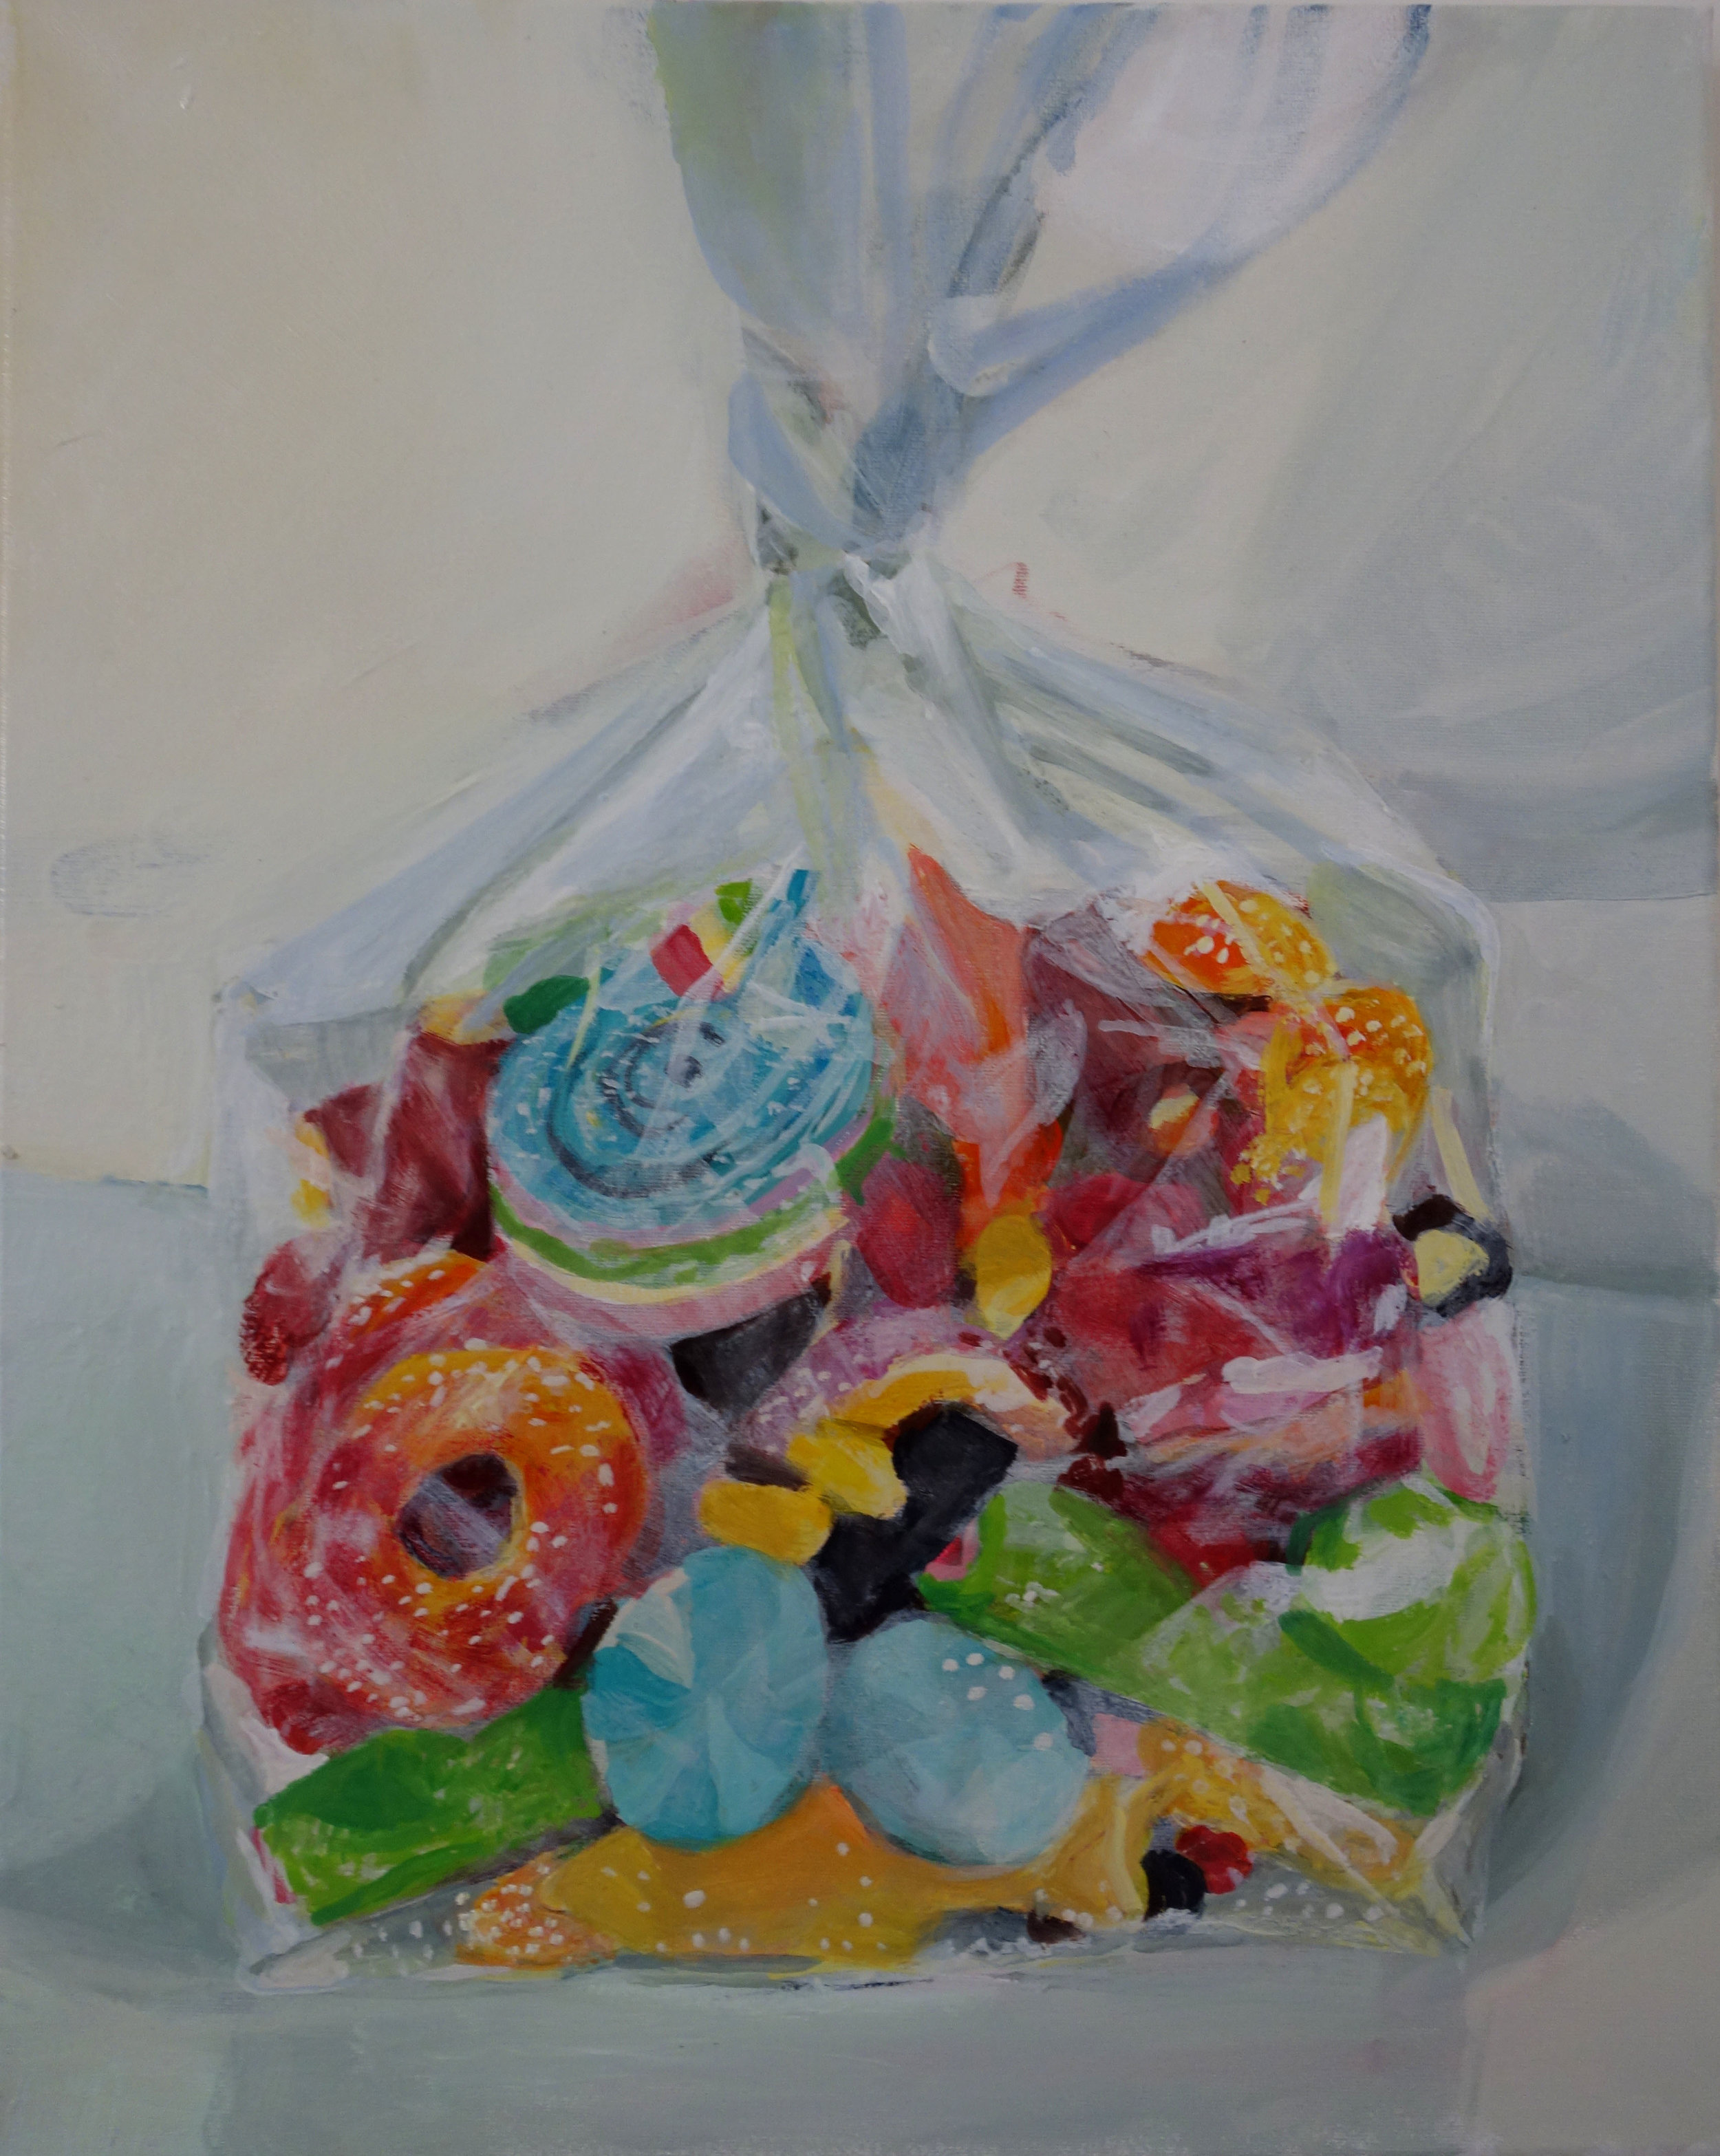 Candy Bag Dinner, 16x20, oil on canvas